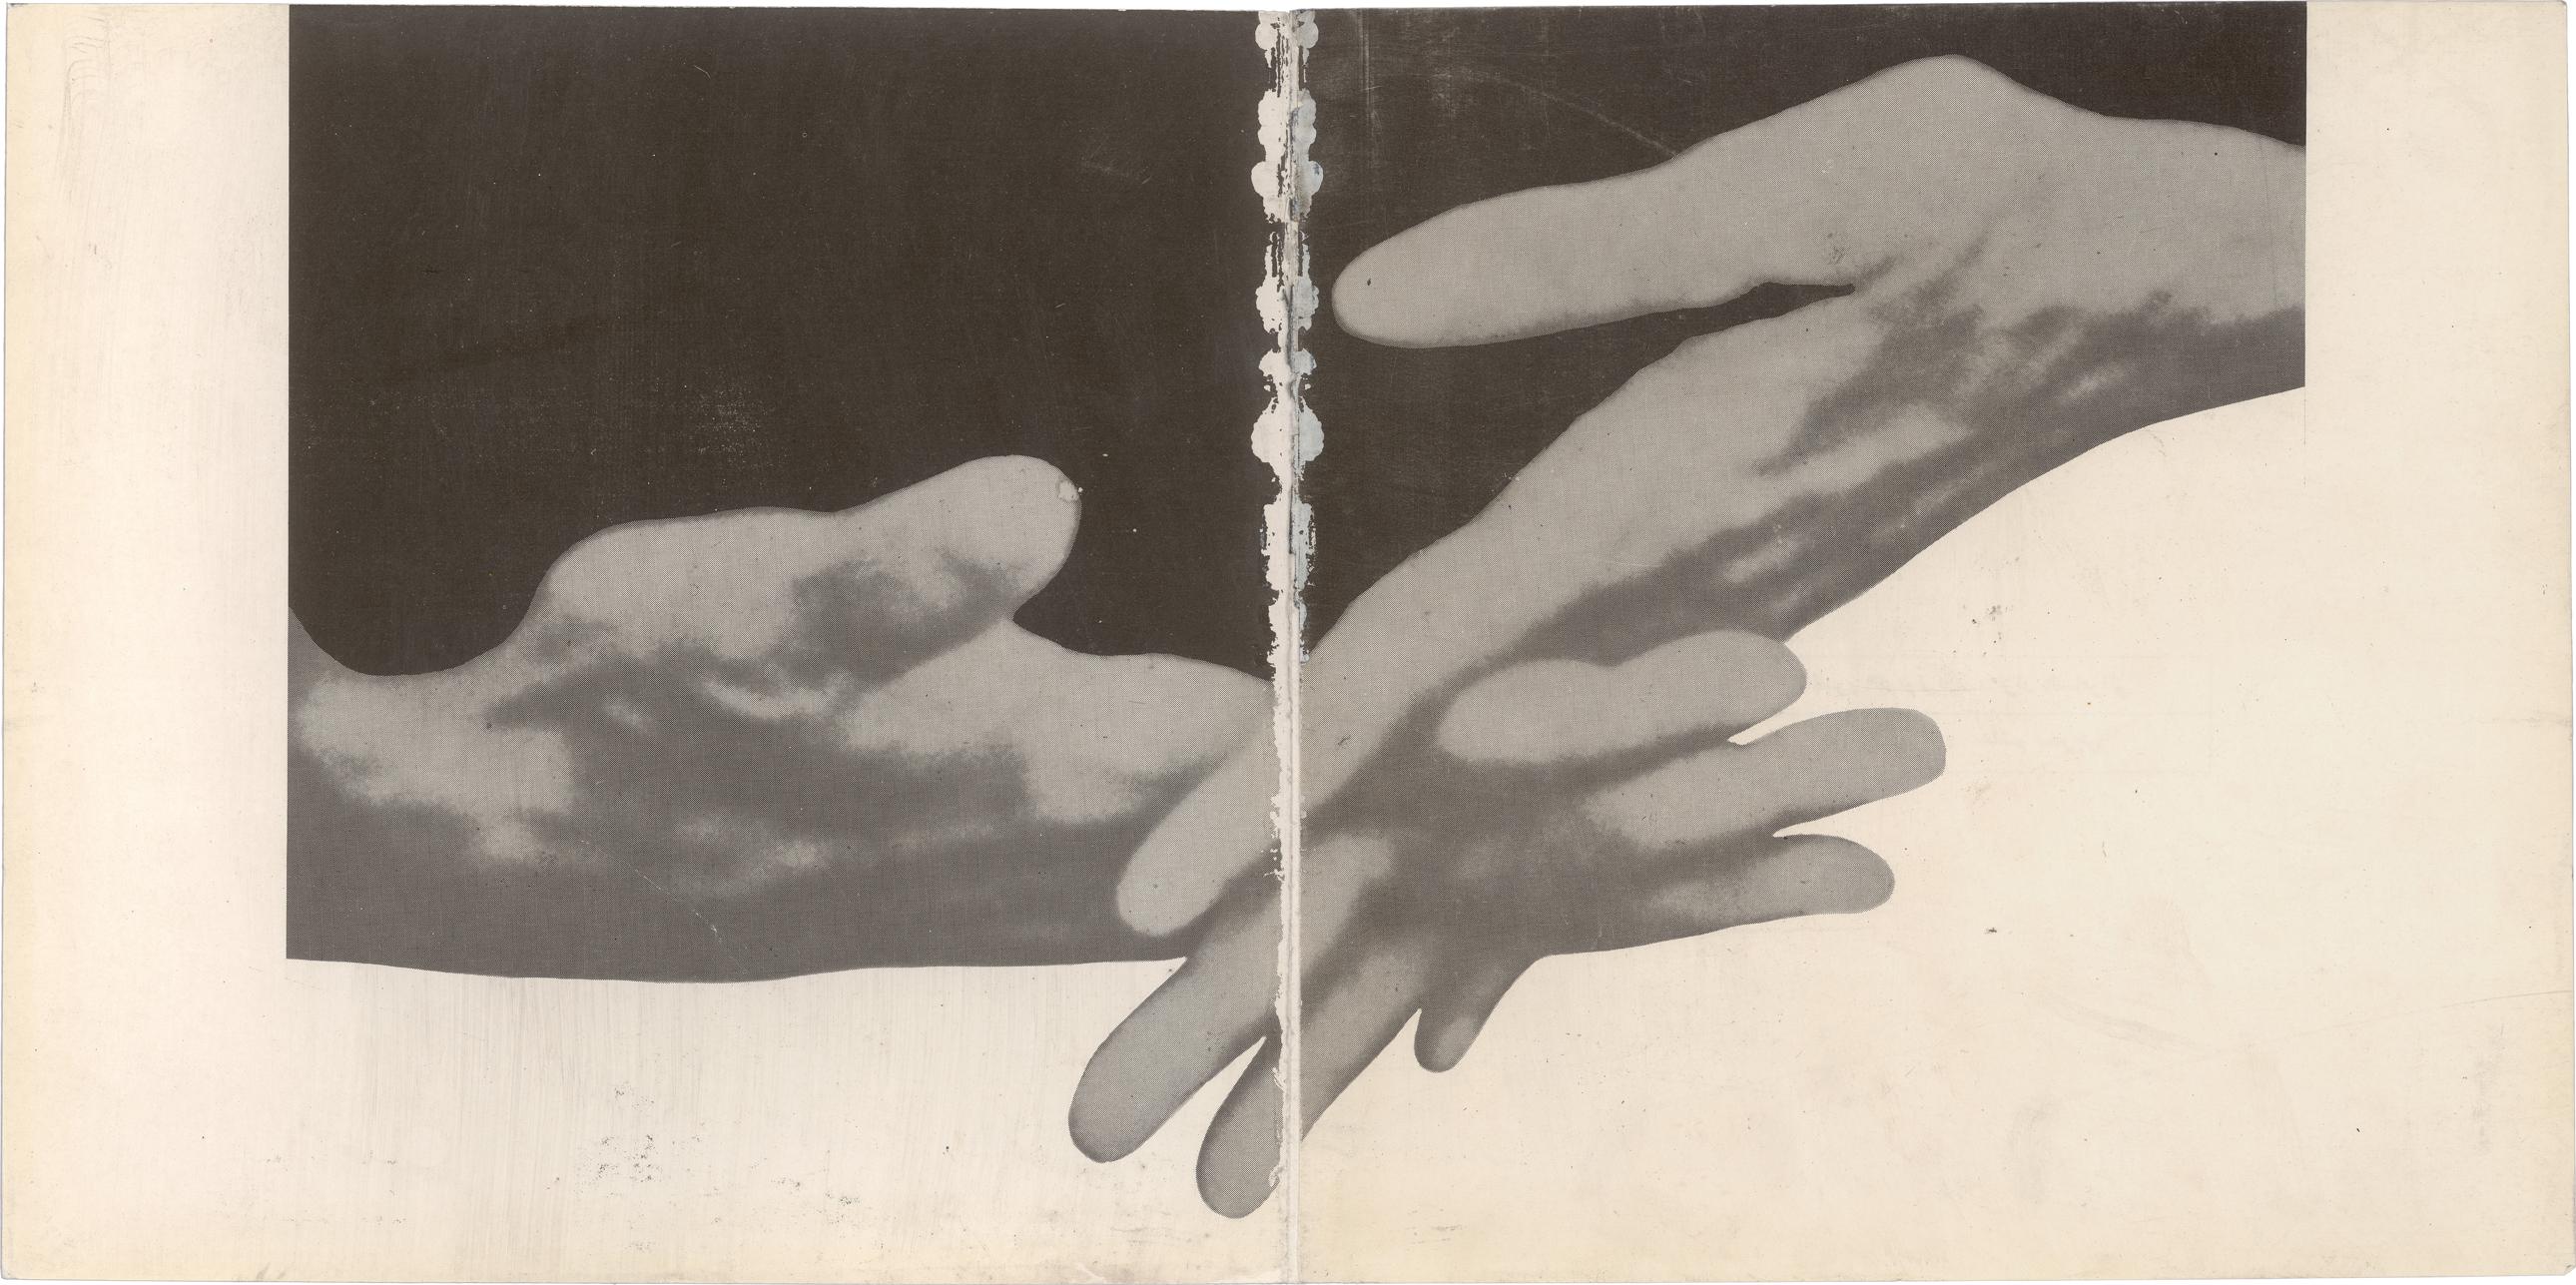 "Alexander Provan, ""Marking the Site of the Original Event,"" archival inkjet print, 2012, detail."